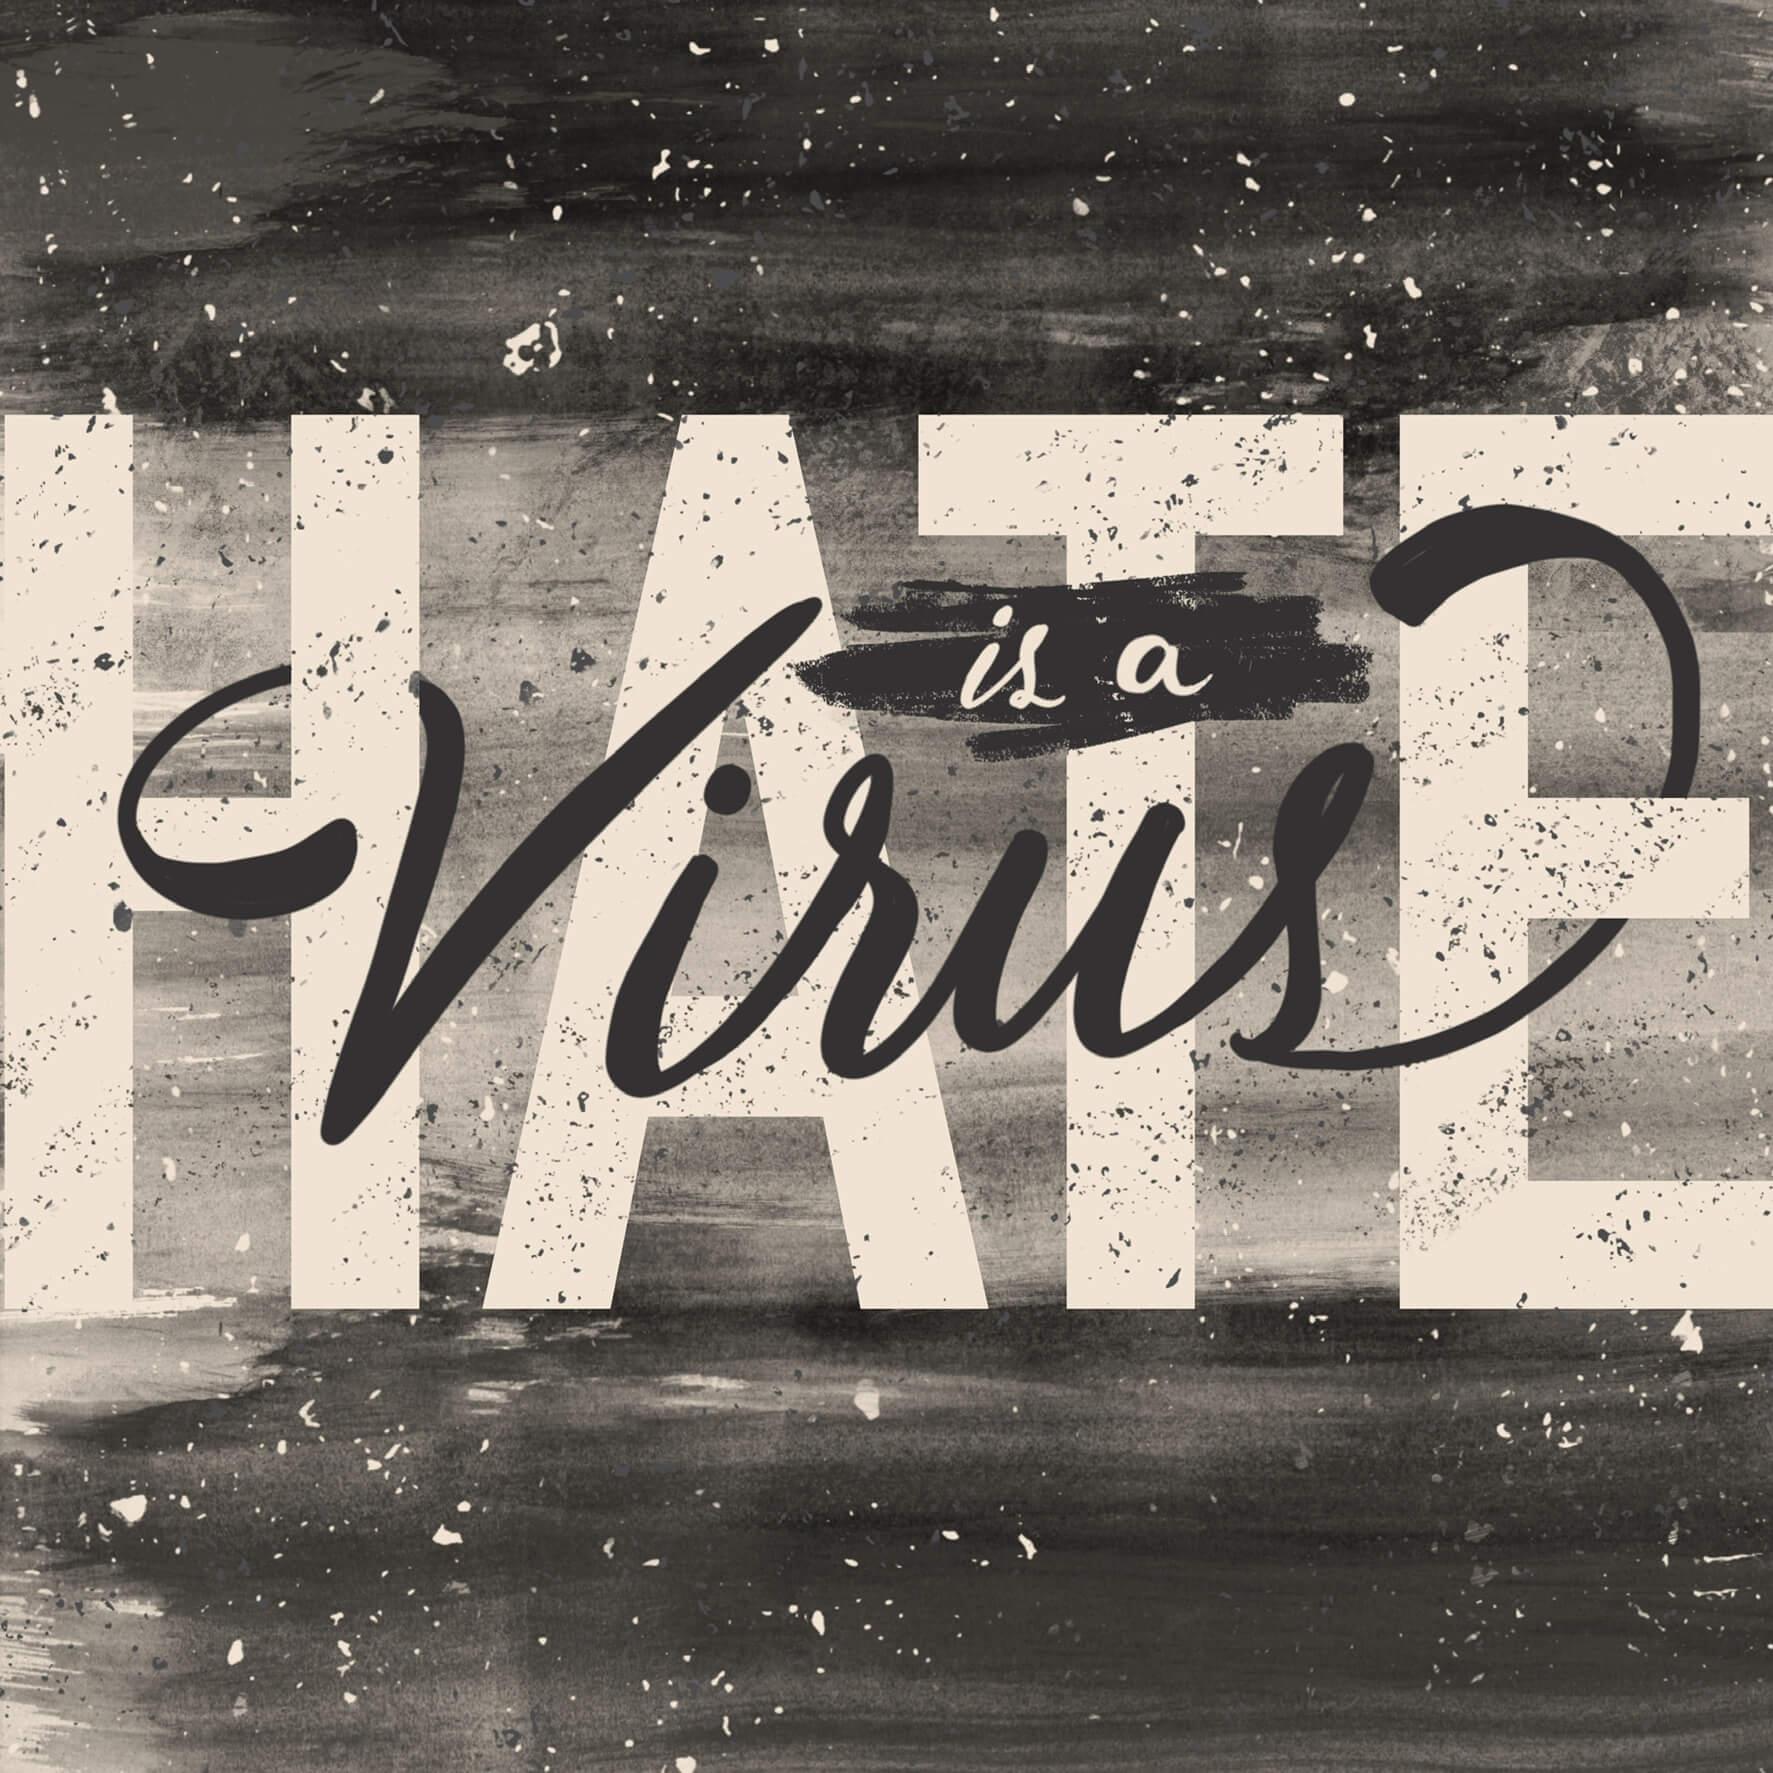 Hate is a Virus - Carose Le